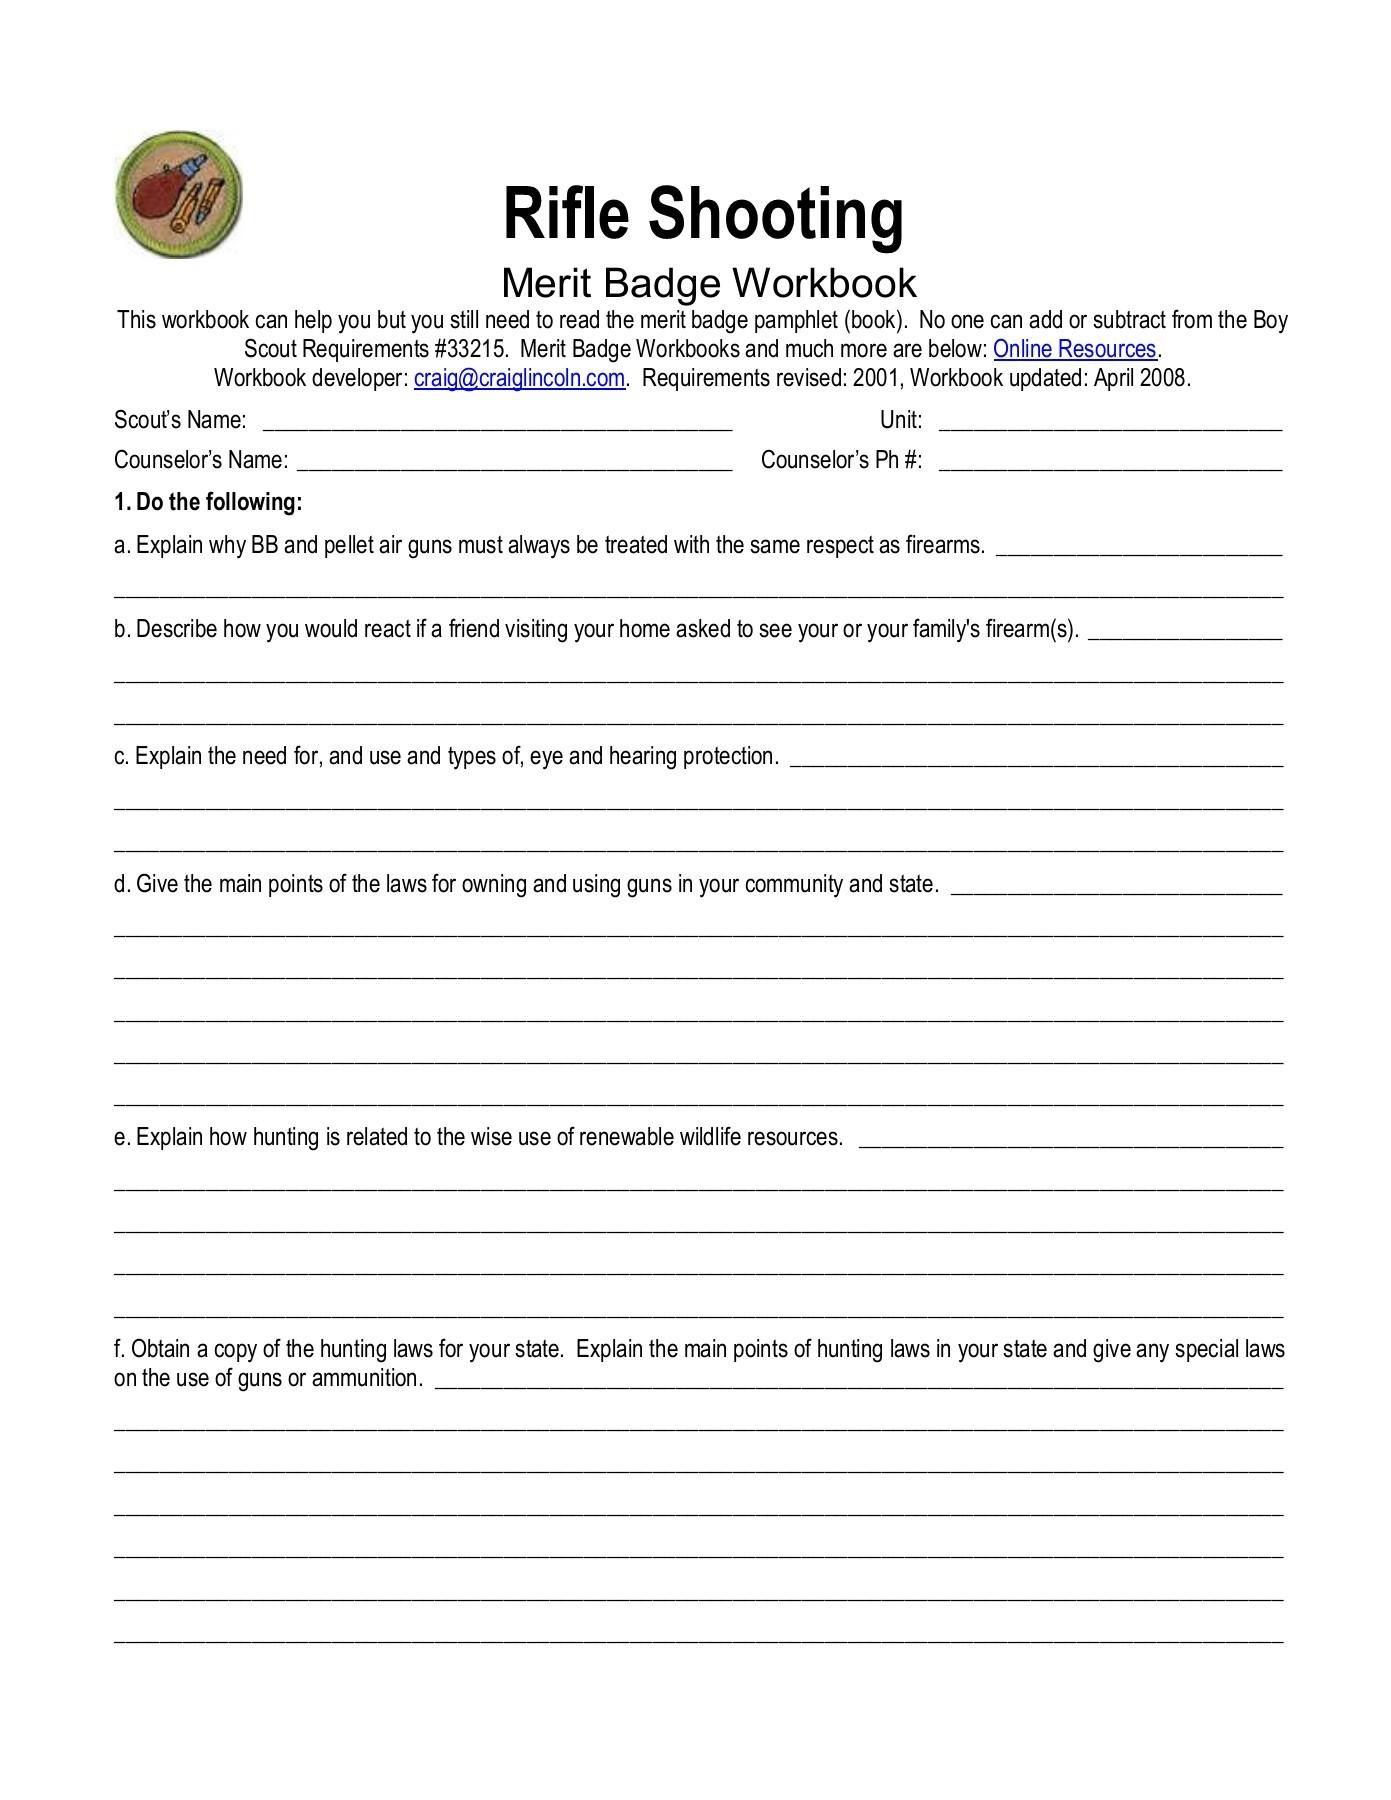 Rifle Shooting Merit Badge Worksheet